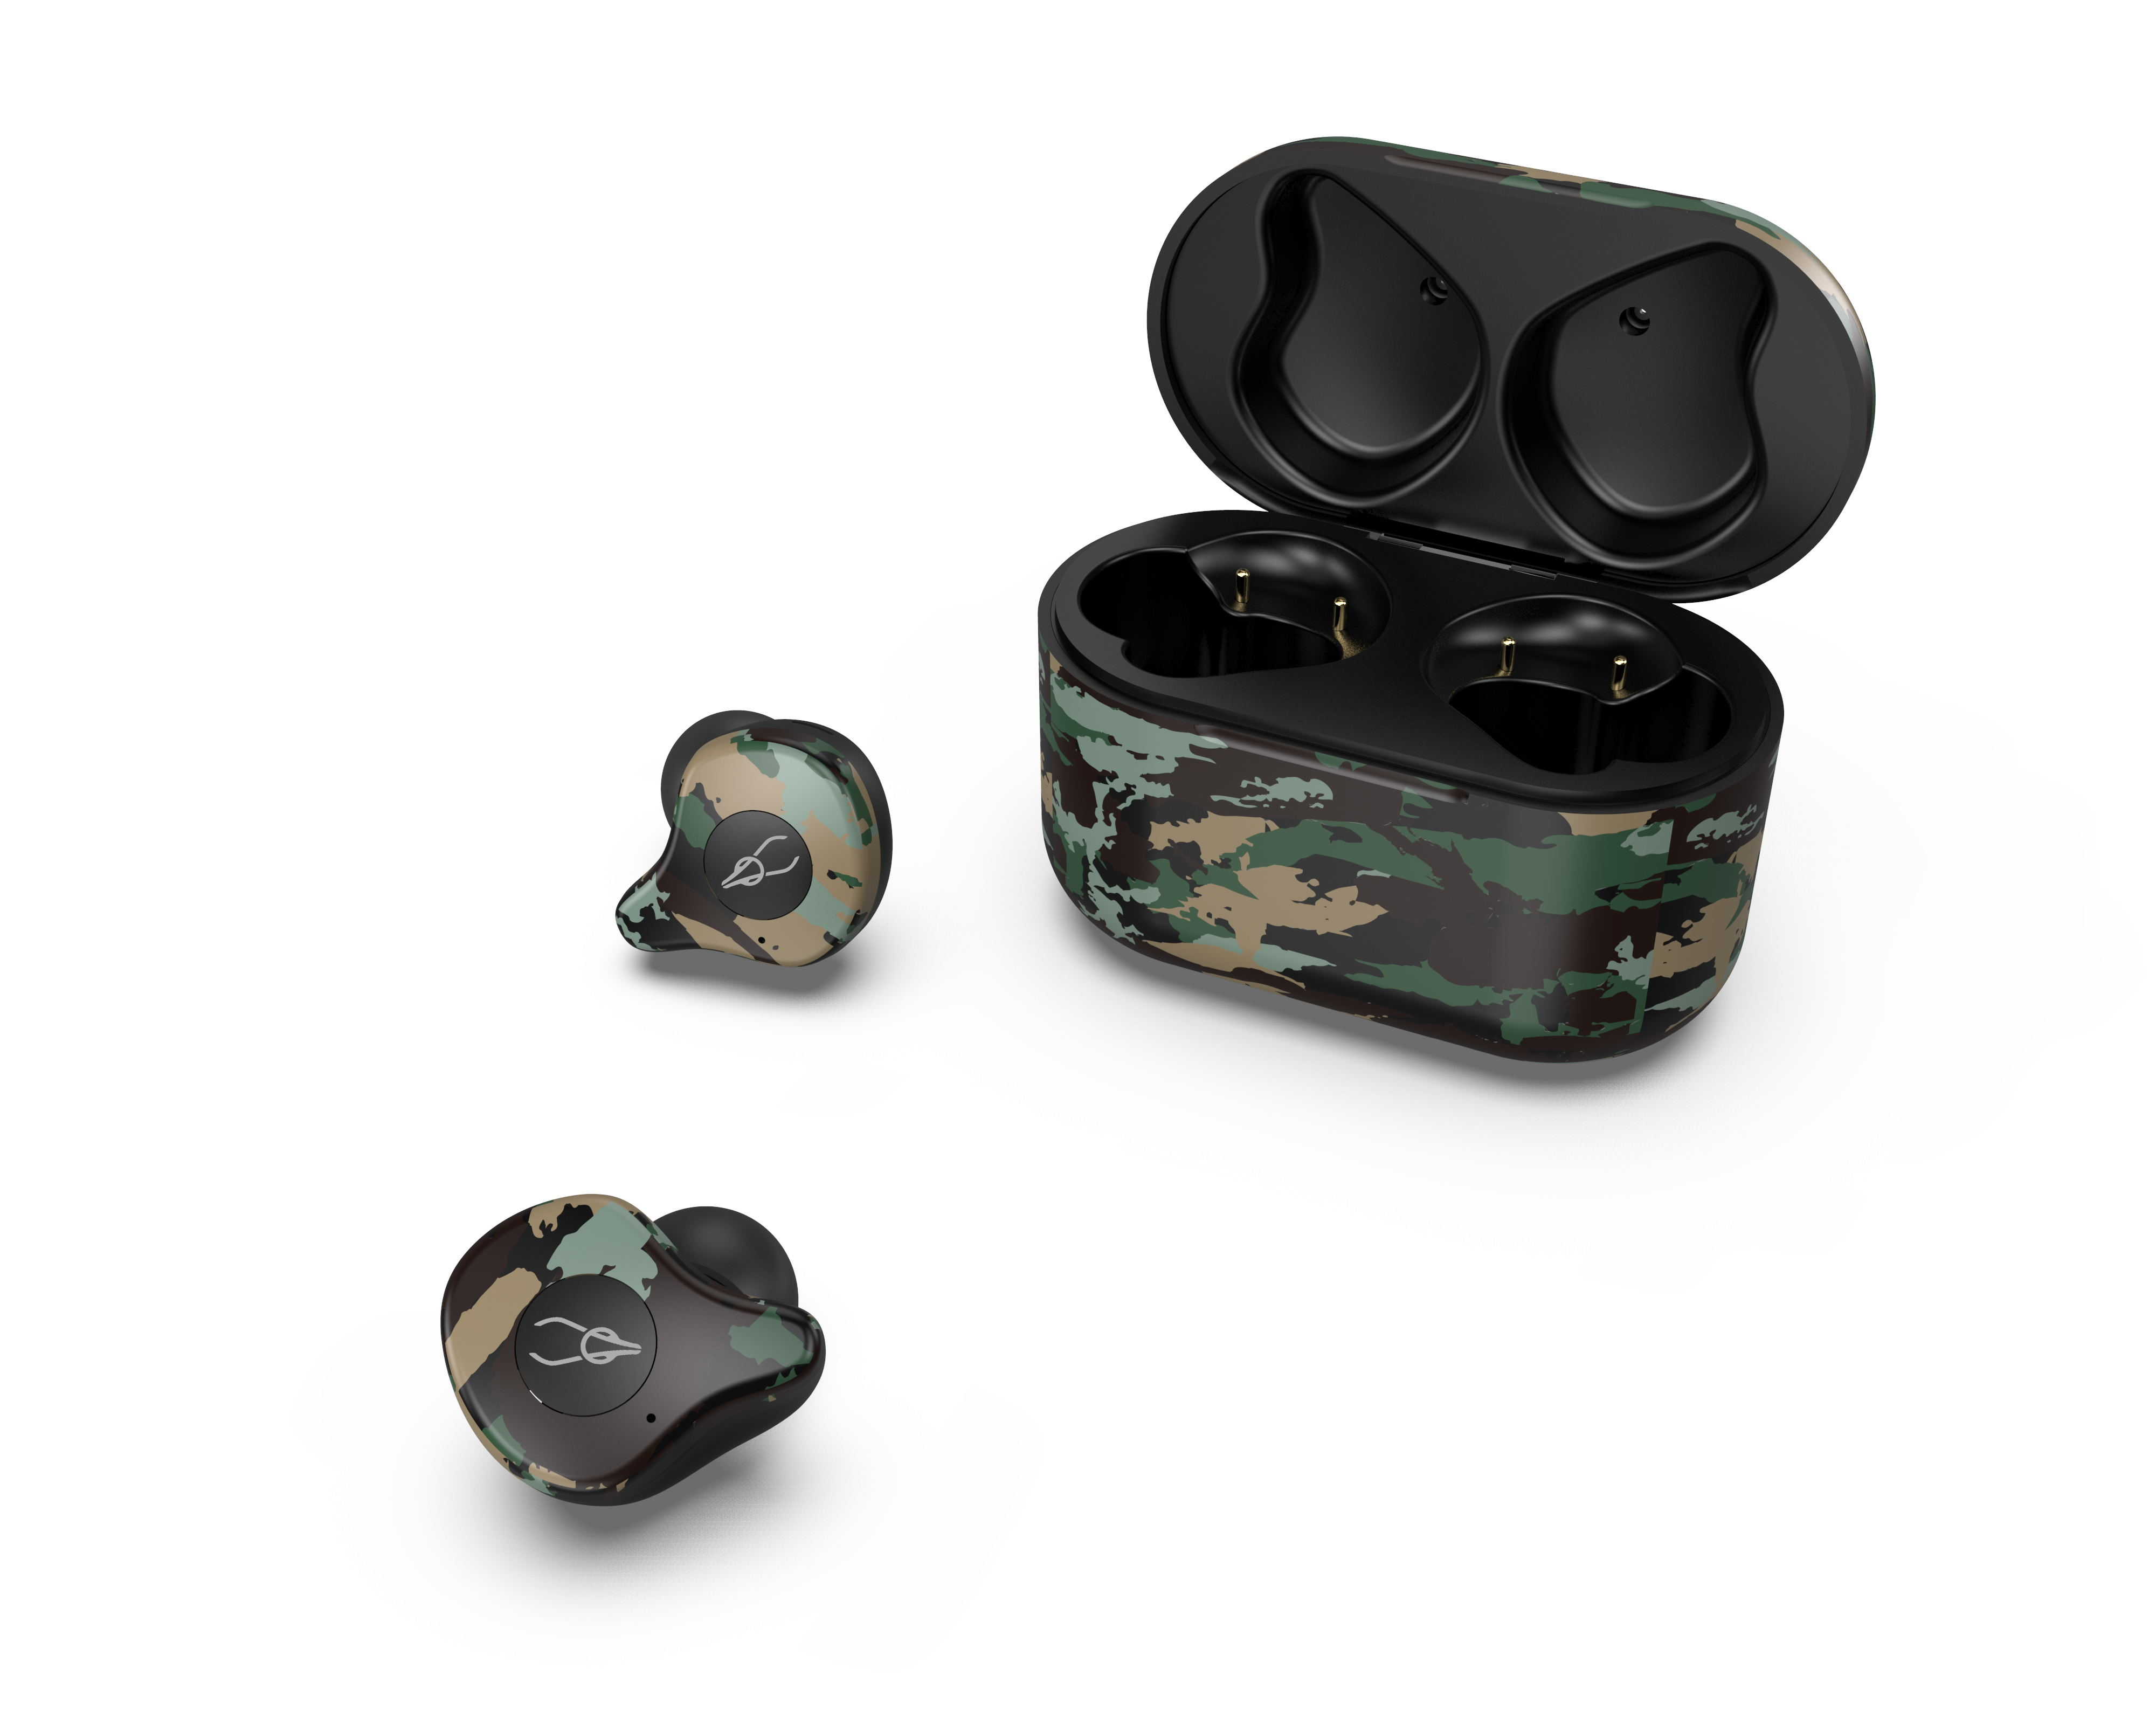 Sabbat E12 Ultra Camouflage TWS Bluetooth 5.0 Earphone Stereo Wireless Sport Earbuds Amazon